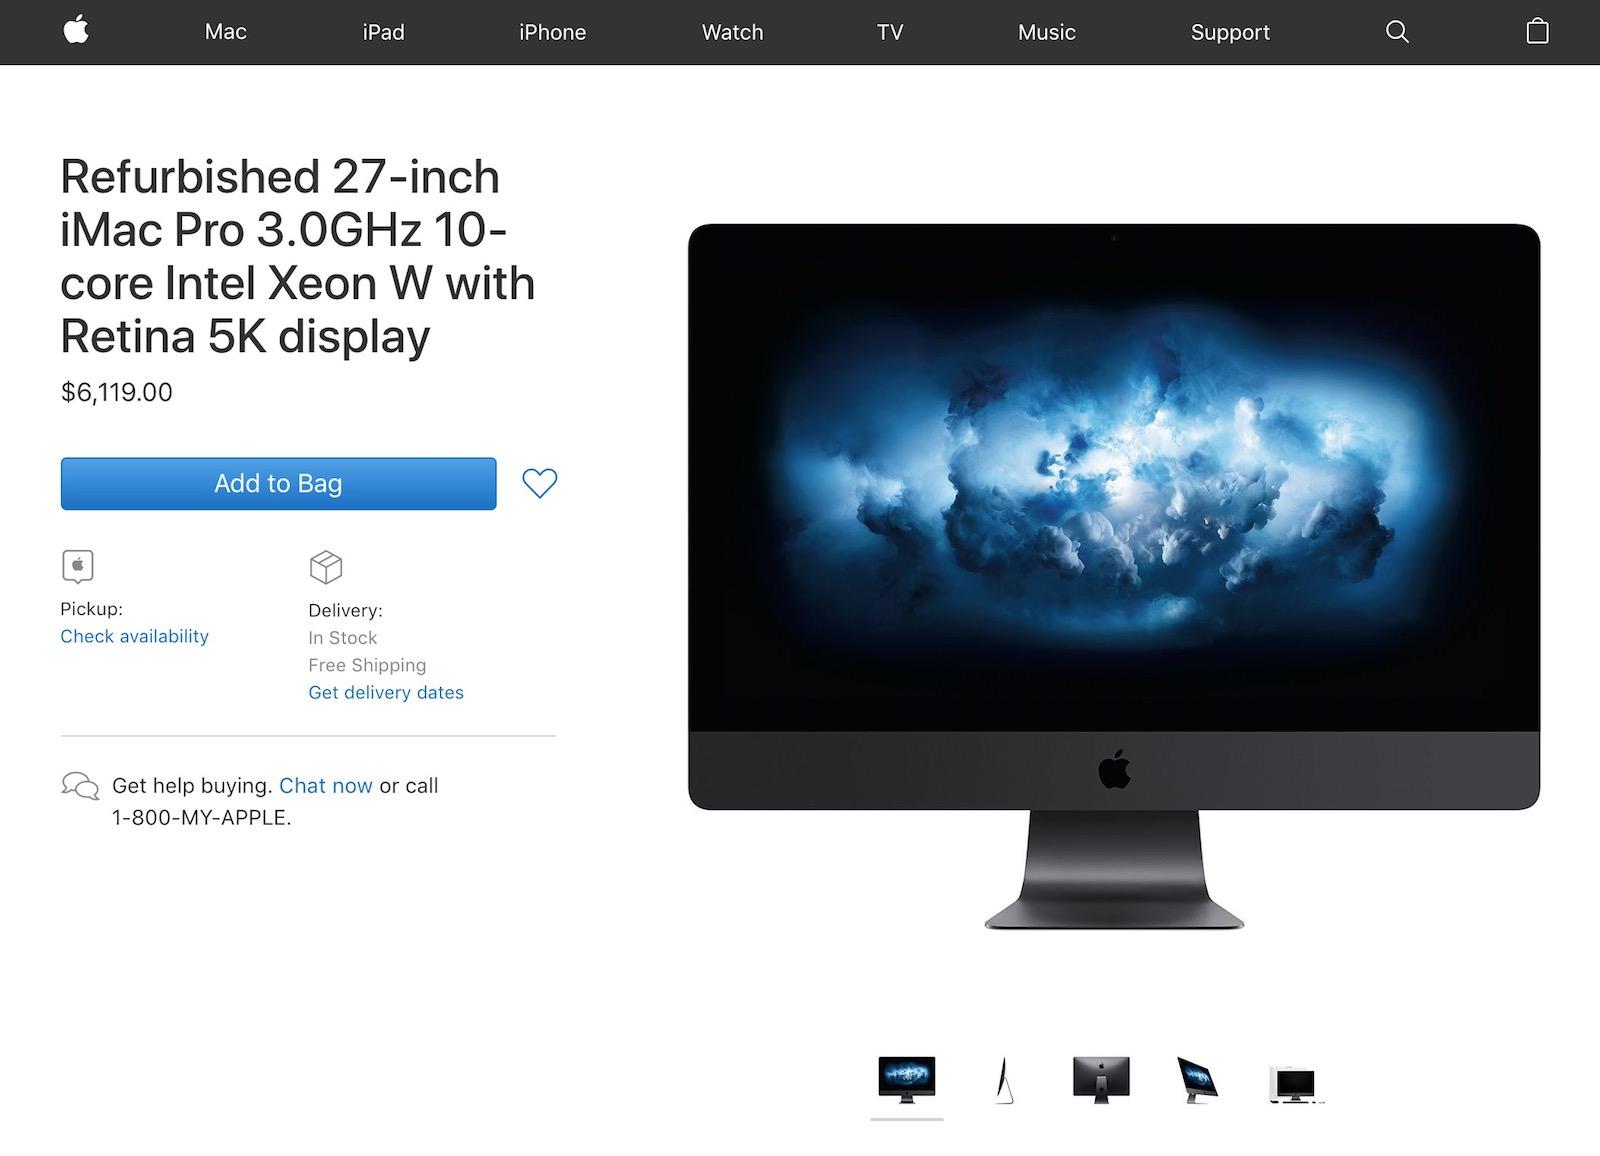 Refurbished-iMac-Pro-Apple-Online-Store-1.jpg